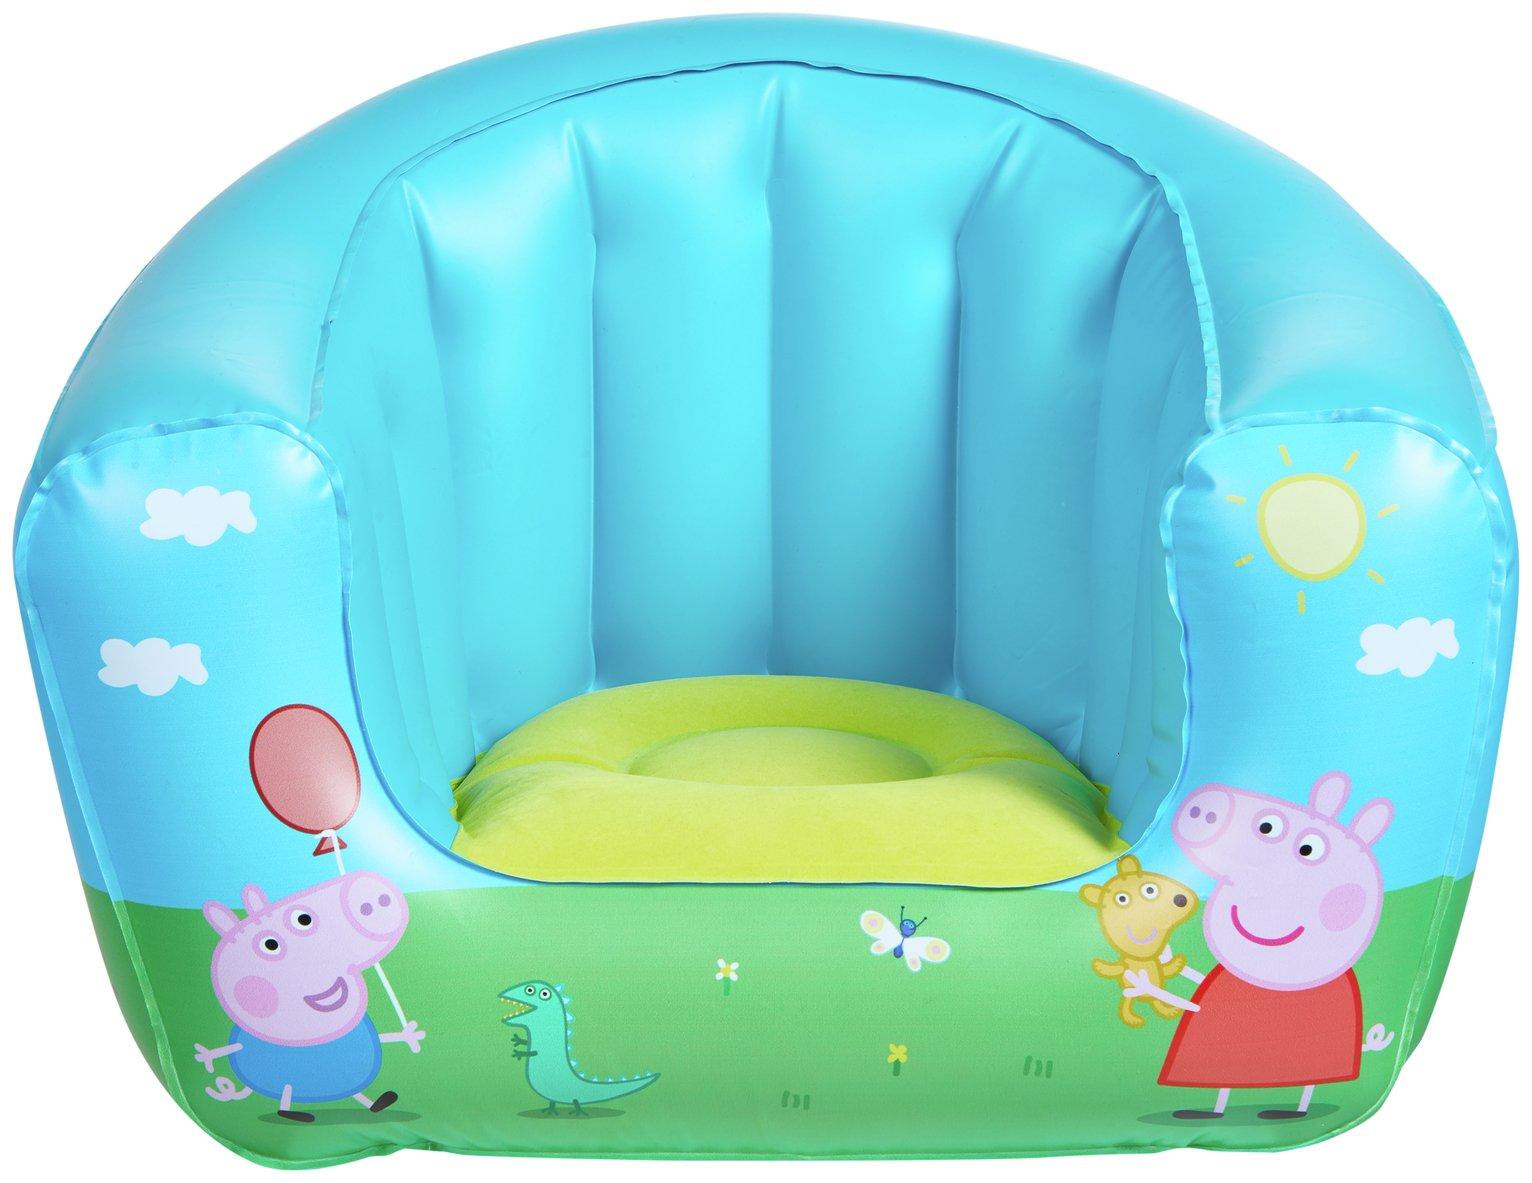 Peppa Pig Armchair Folding Chair Peppa Pig Folding Chair